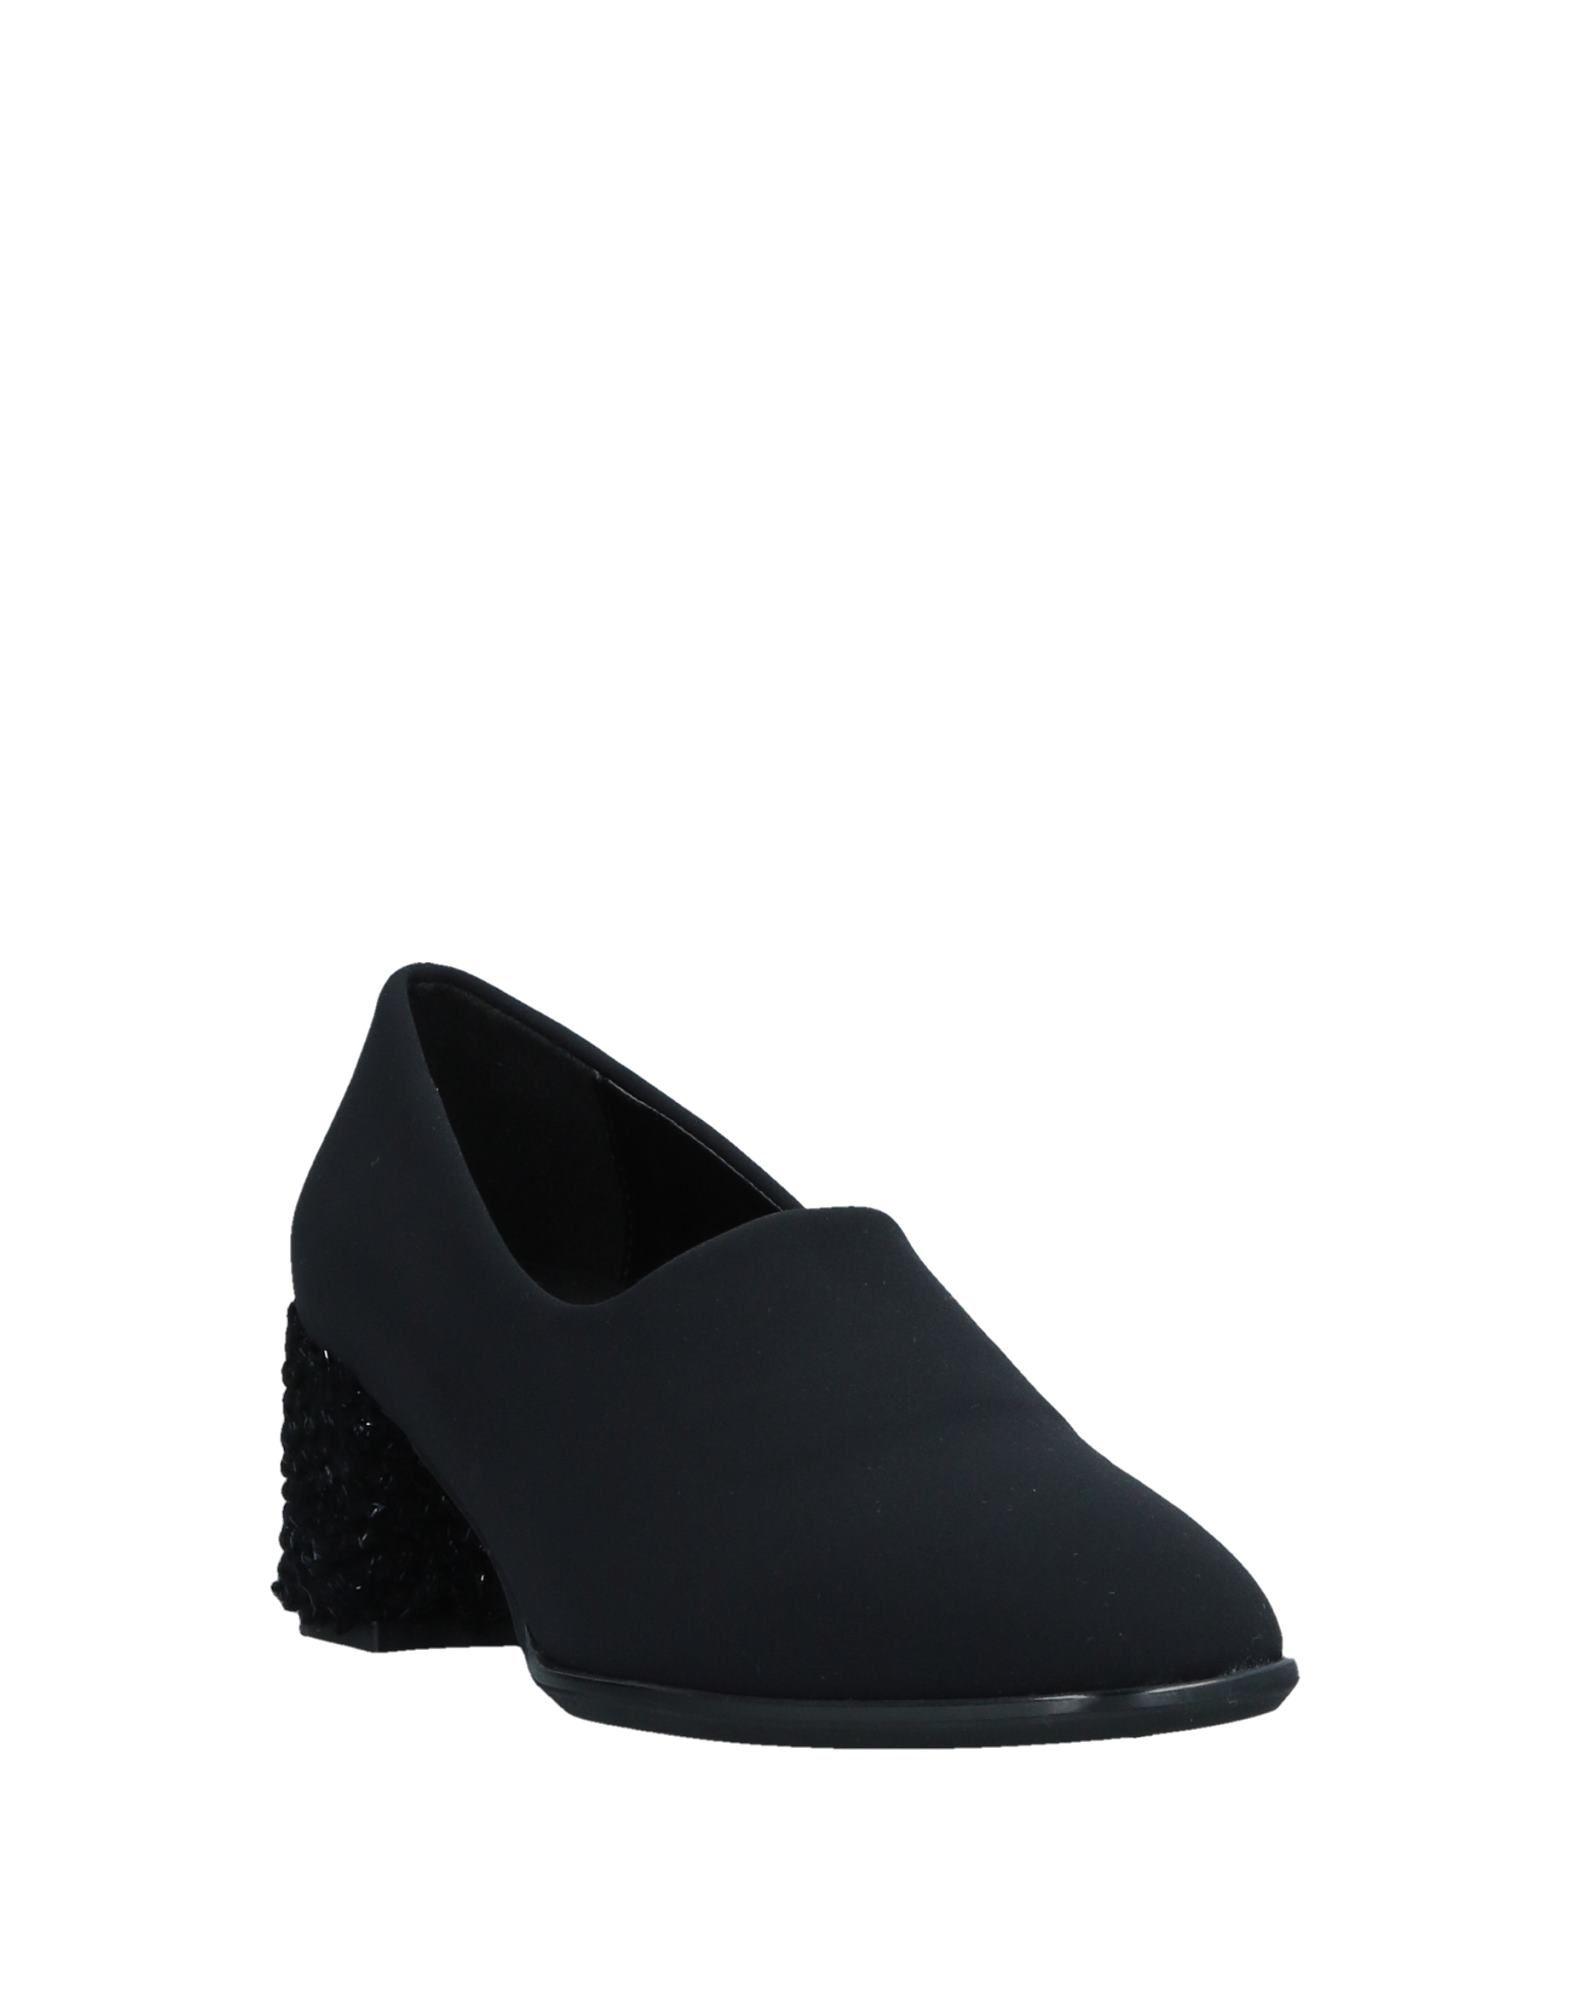 Nr Rapisardi Pumps Qualität Damen  11504777LM Gute Qualität Pumps beliebte Schuhe 91af64